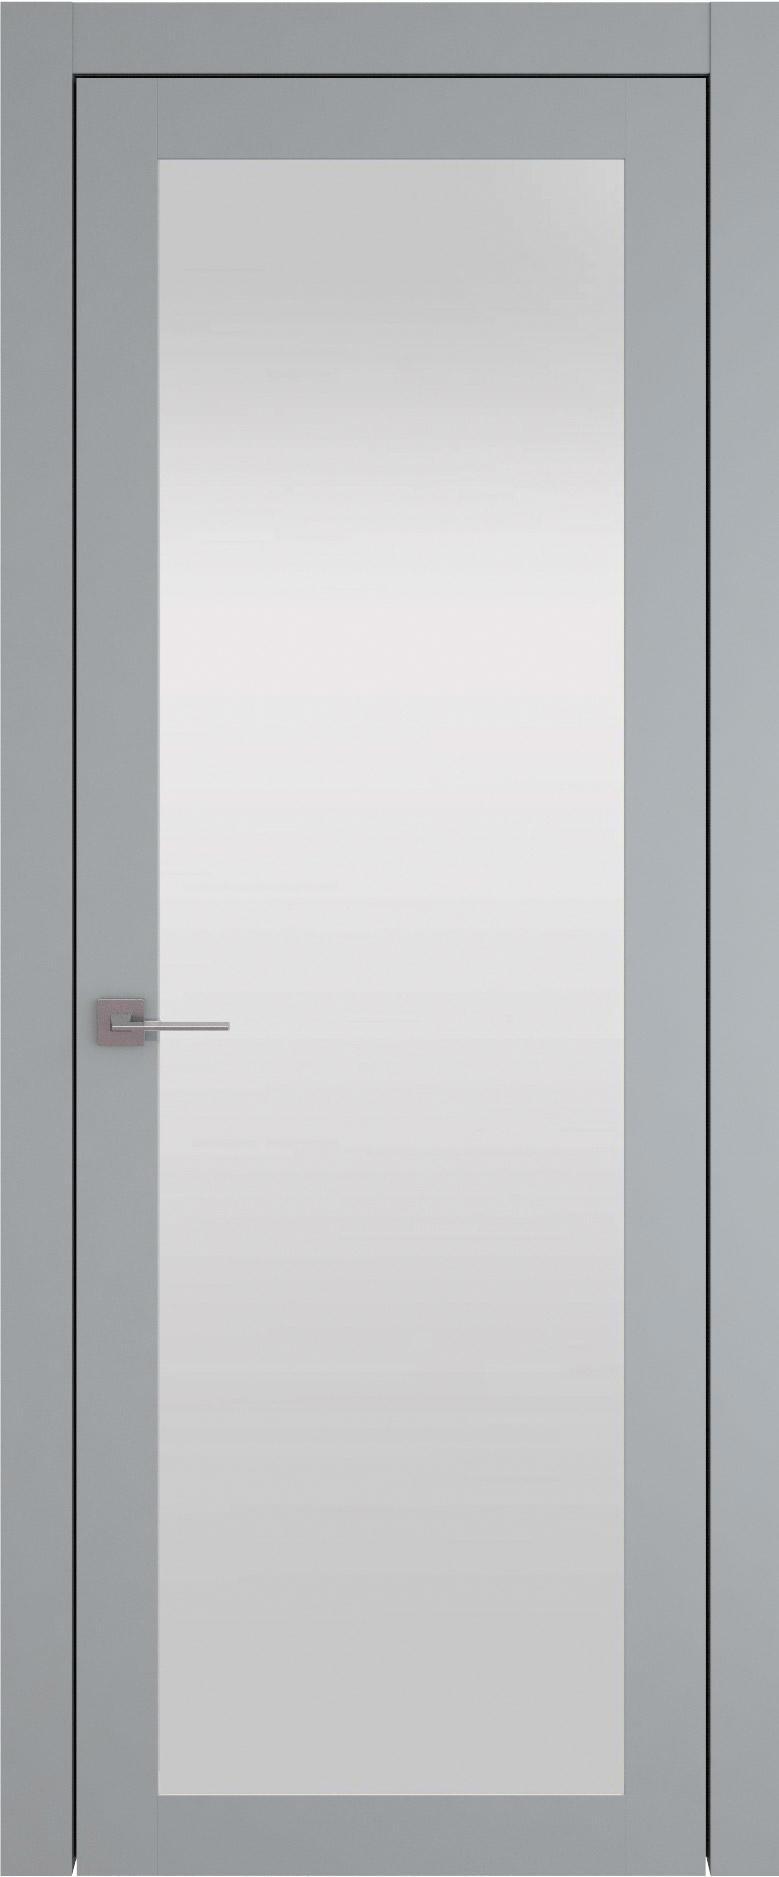 Tivoli З-1 цвет - Серебристо-серая эмаль (RAL 7045) Со стеклом (ДО)